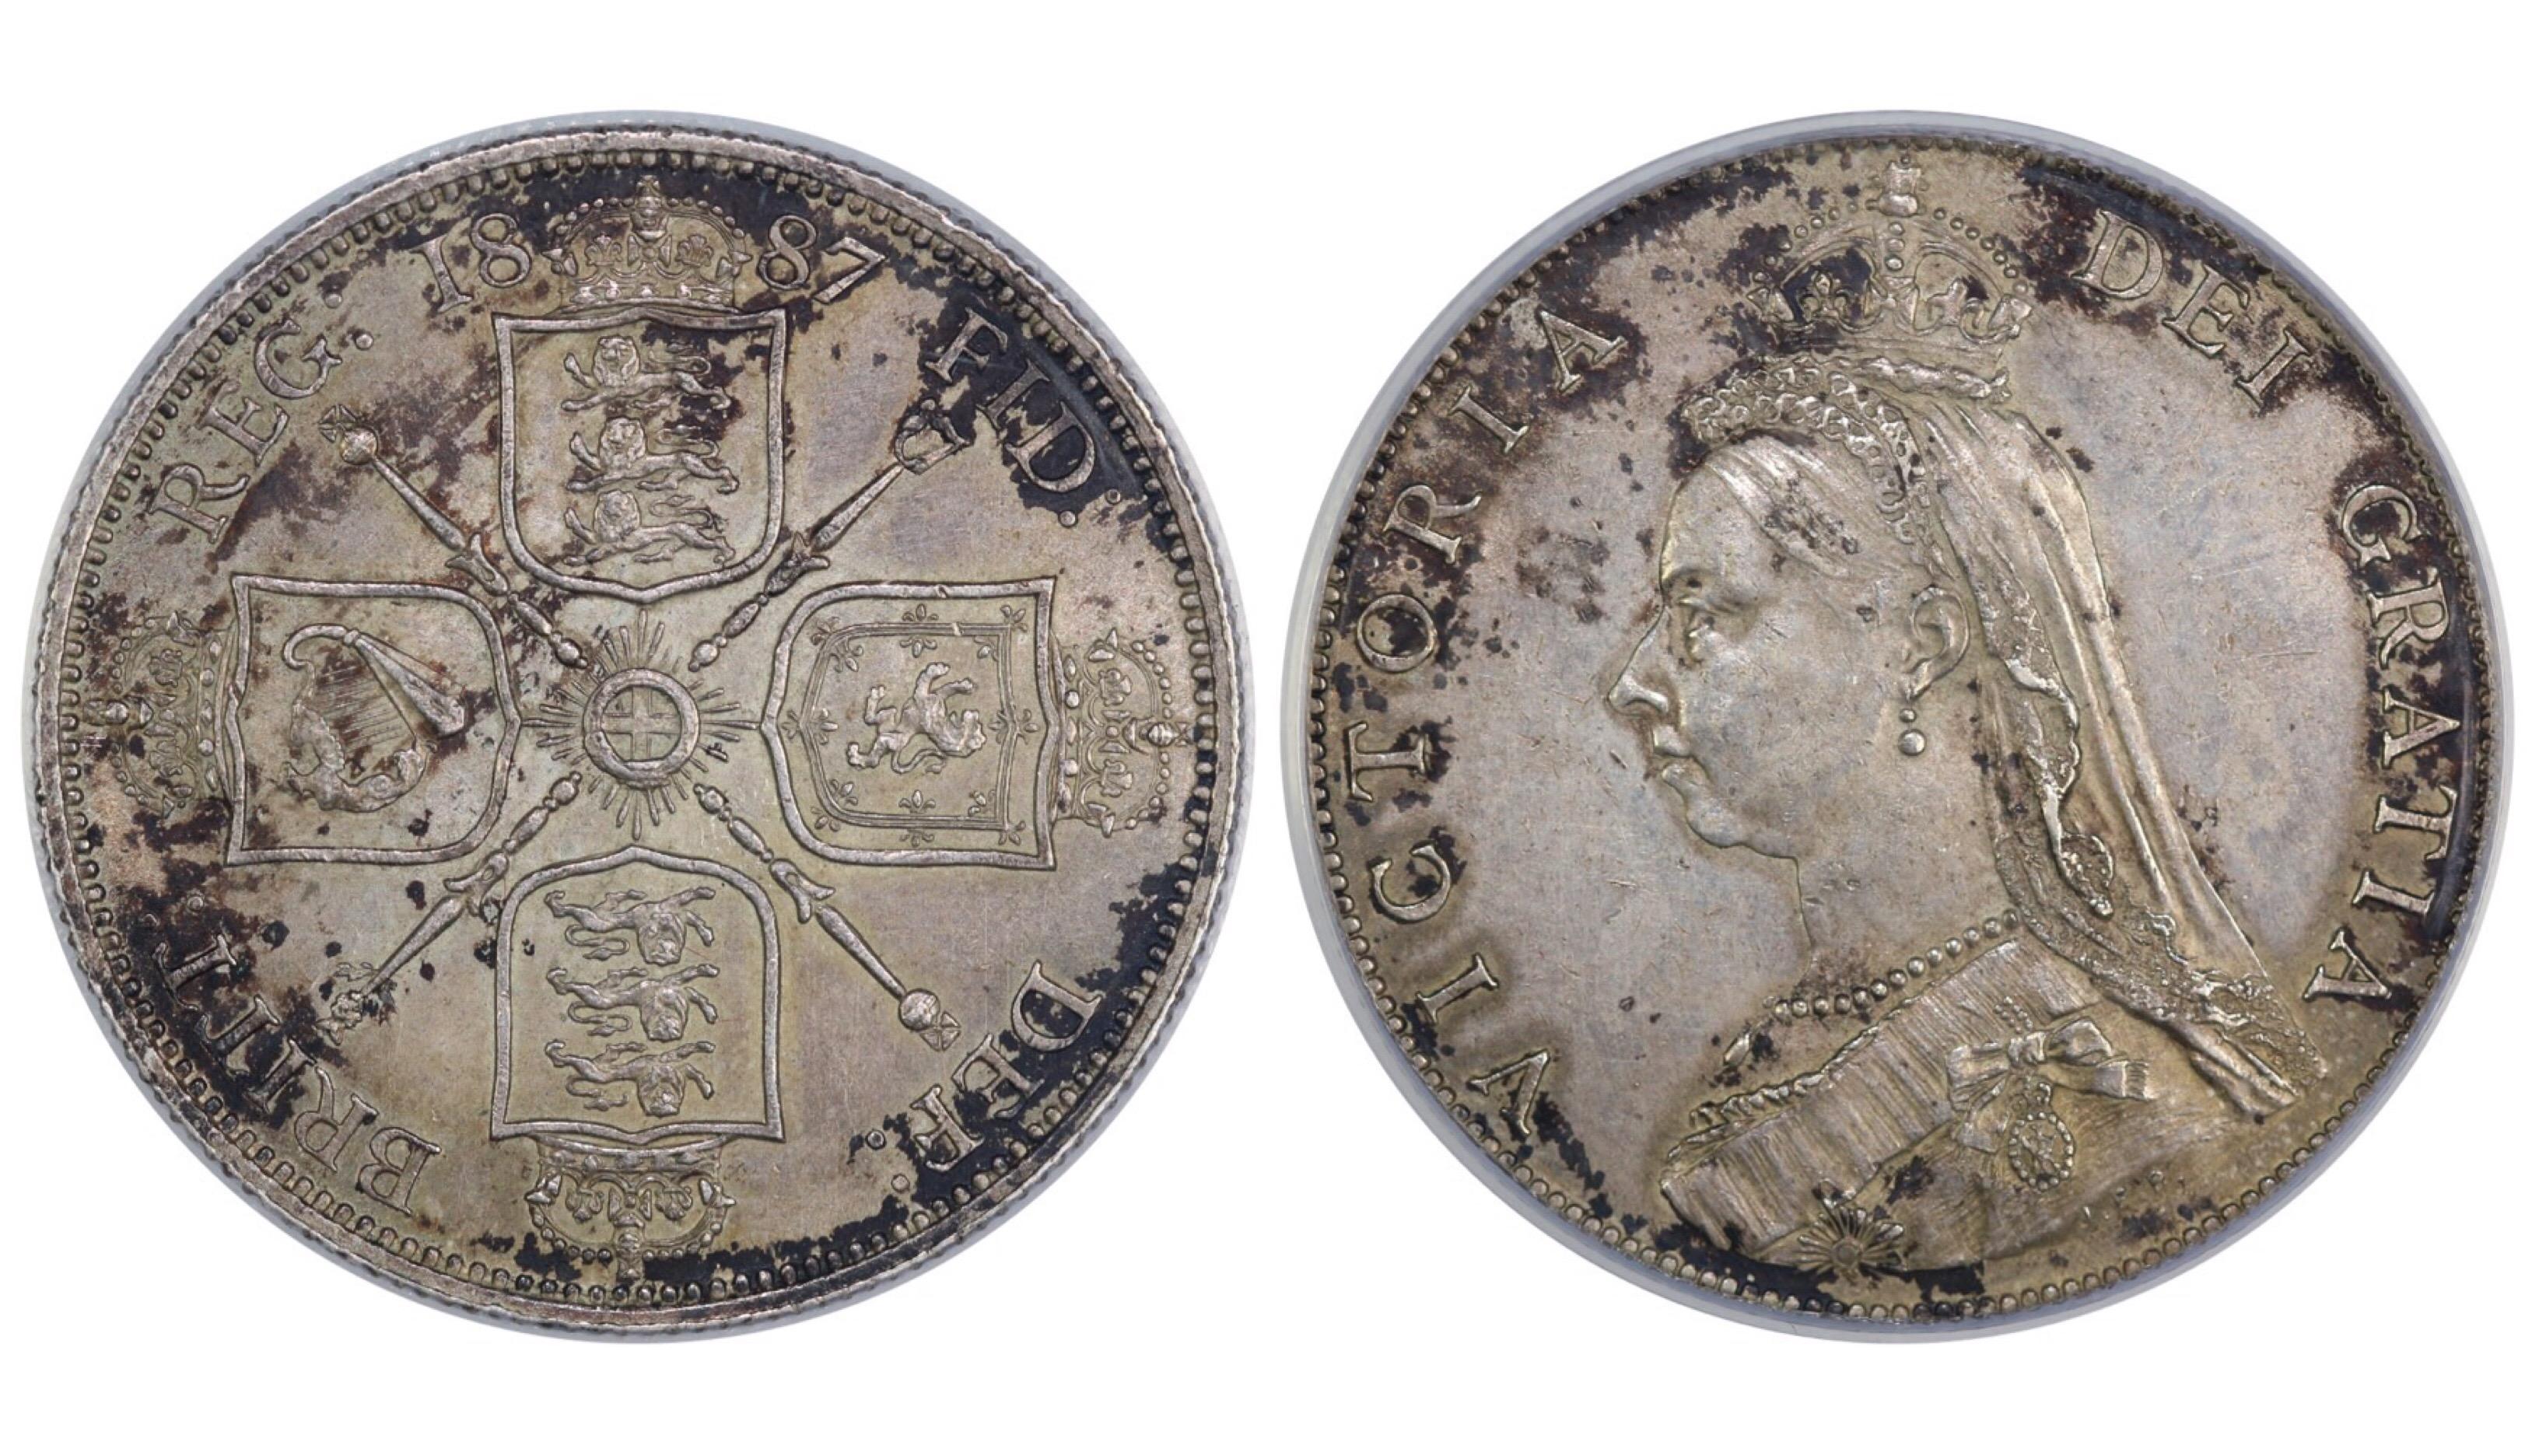 1887 Florin, CGS 65, Victoria, Davies 810, UIN 13753